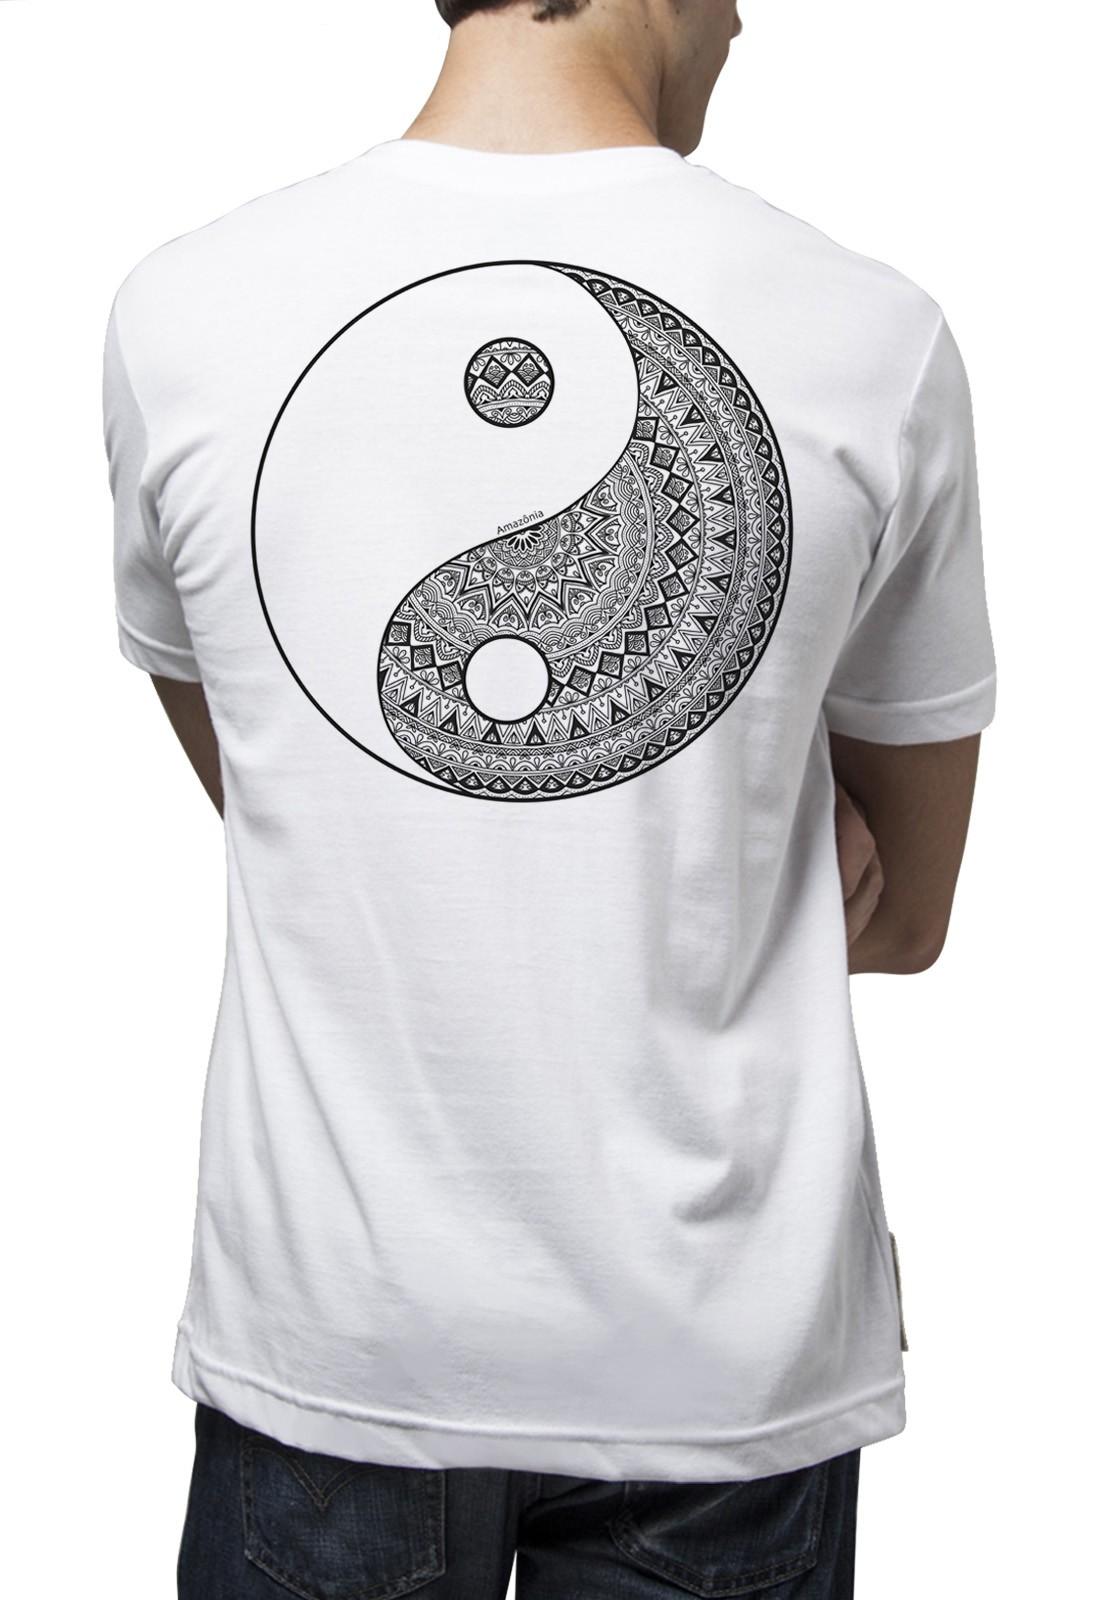 Camiseta Amazônia Yin Yang Tribal - Branco